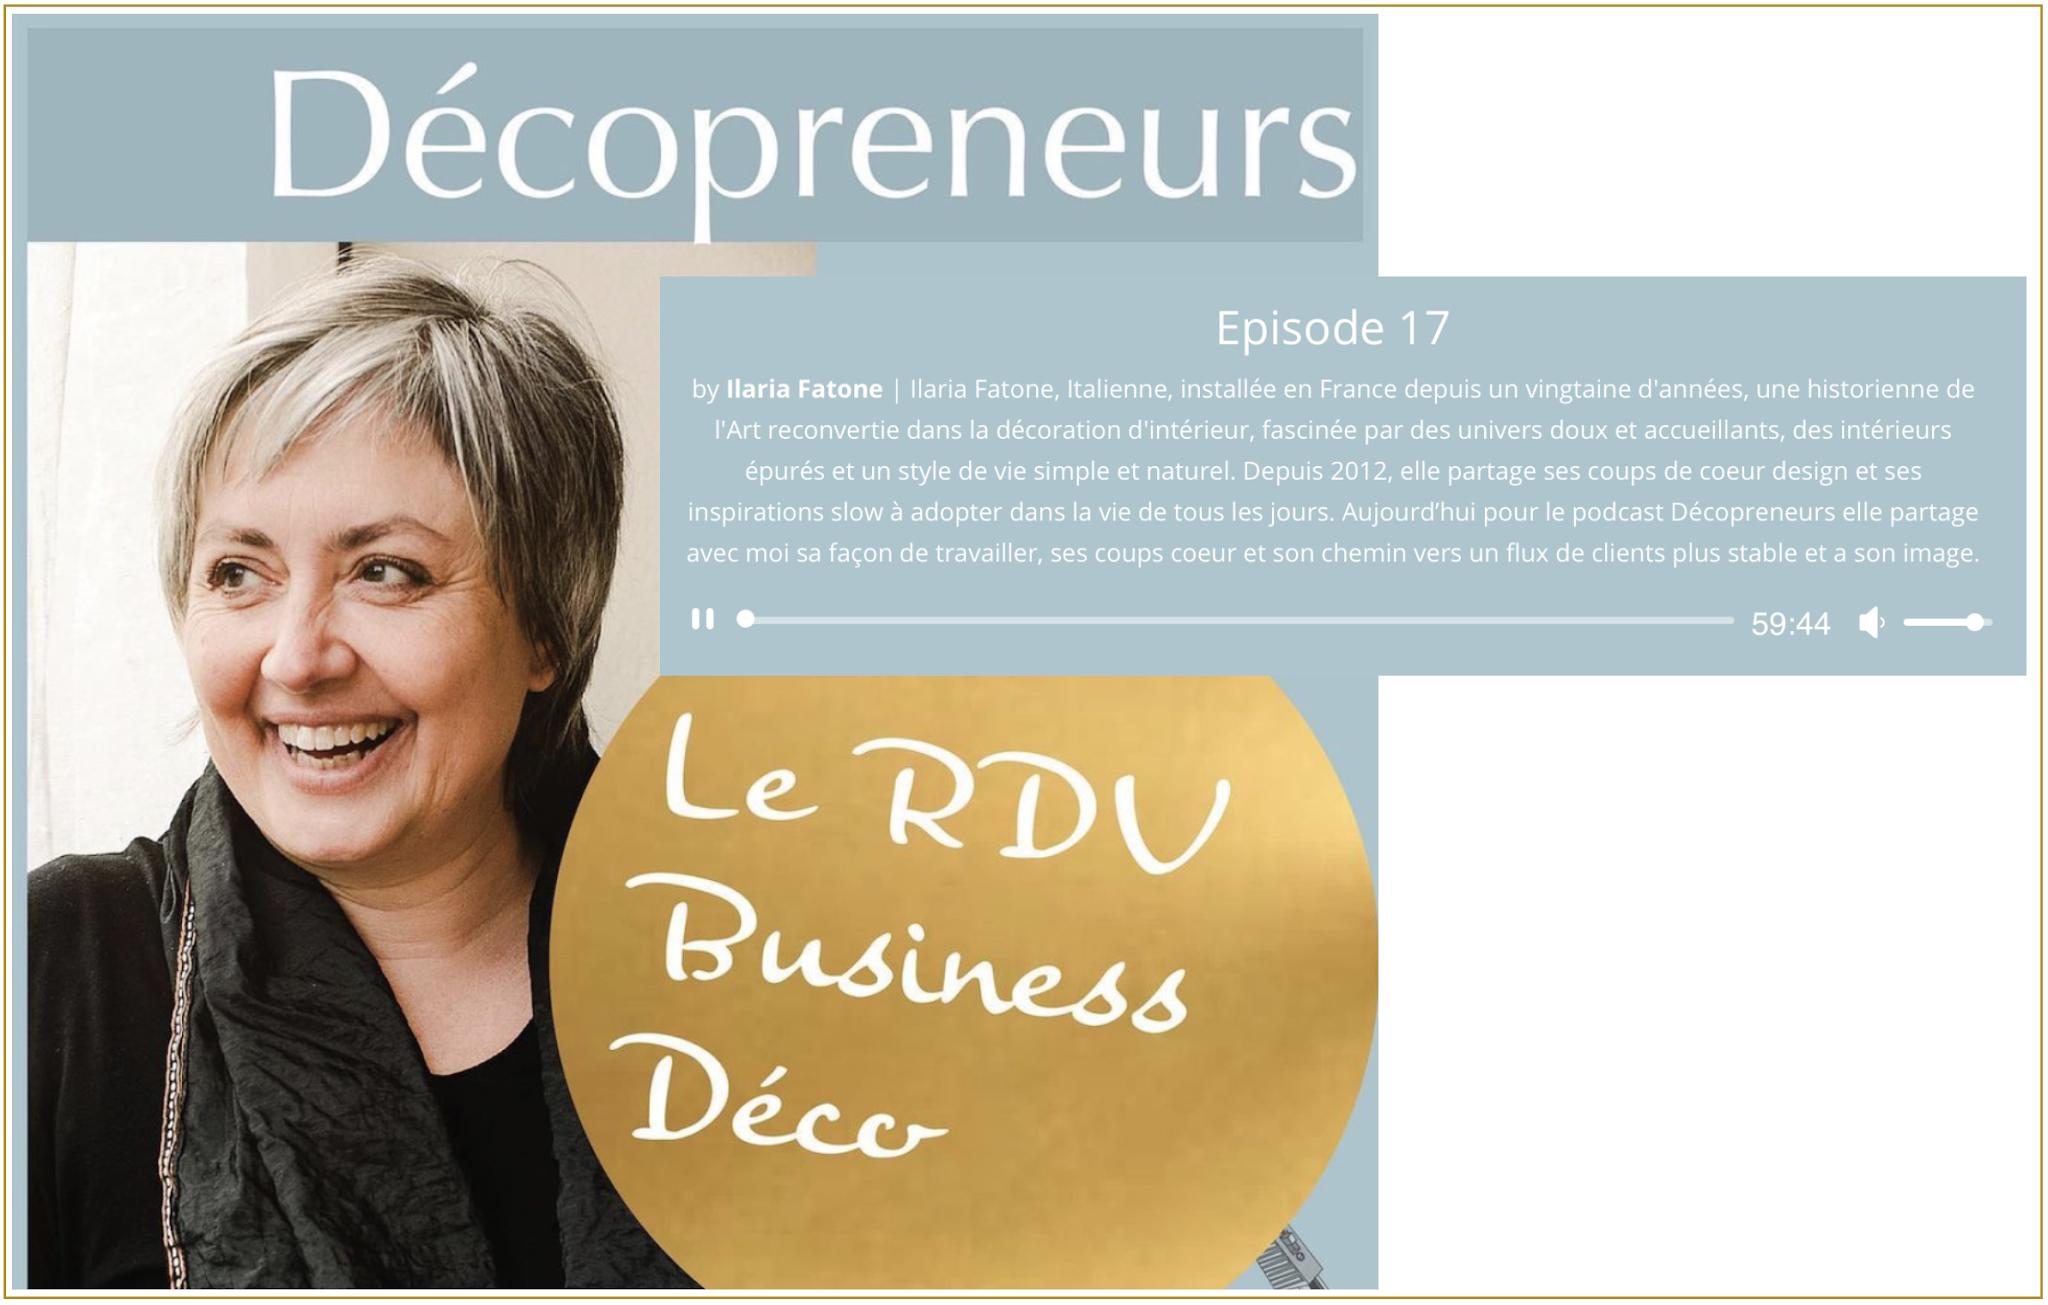 ilaria fatone - presse - decopreneur podcast